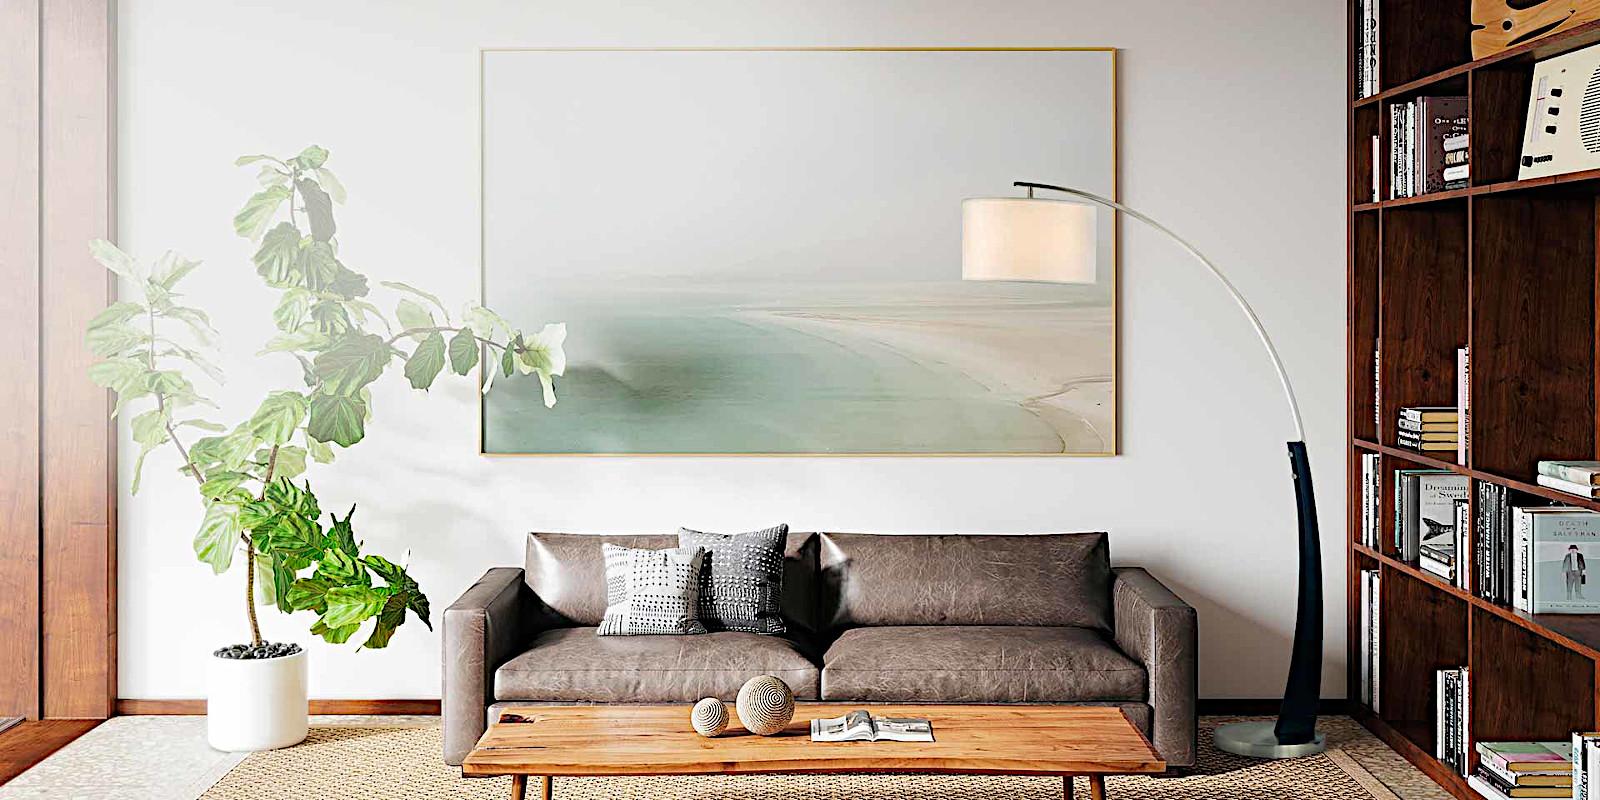 Remarkable modern lighting and decor